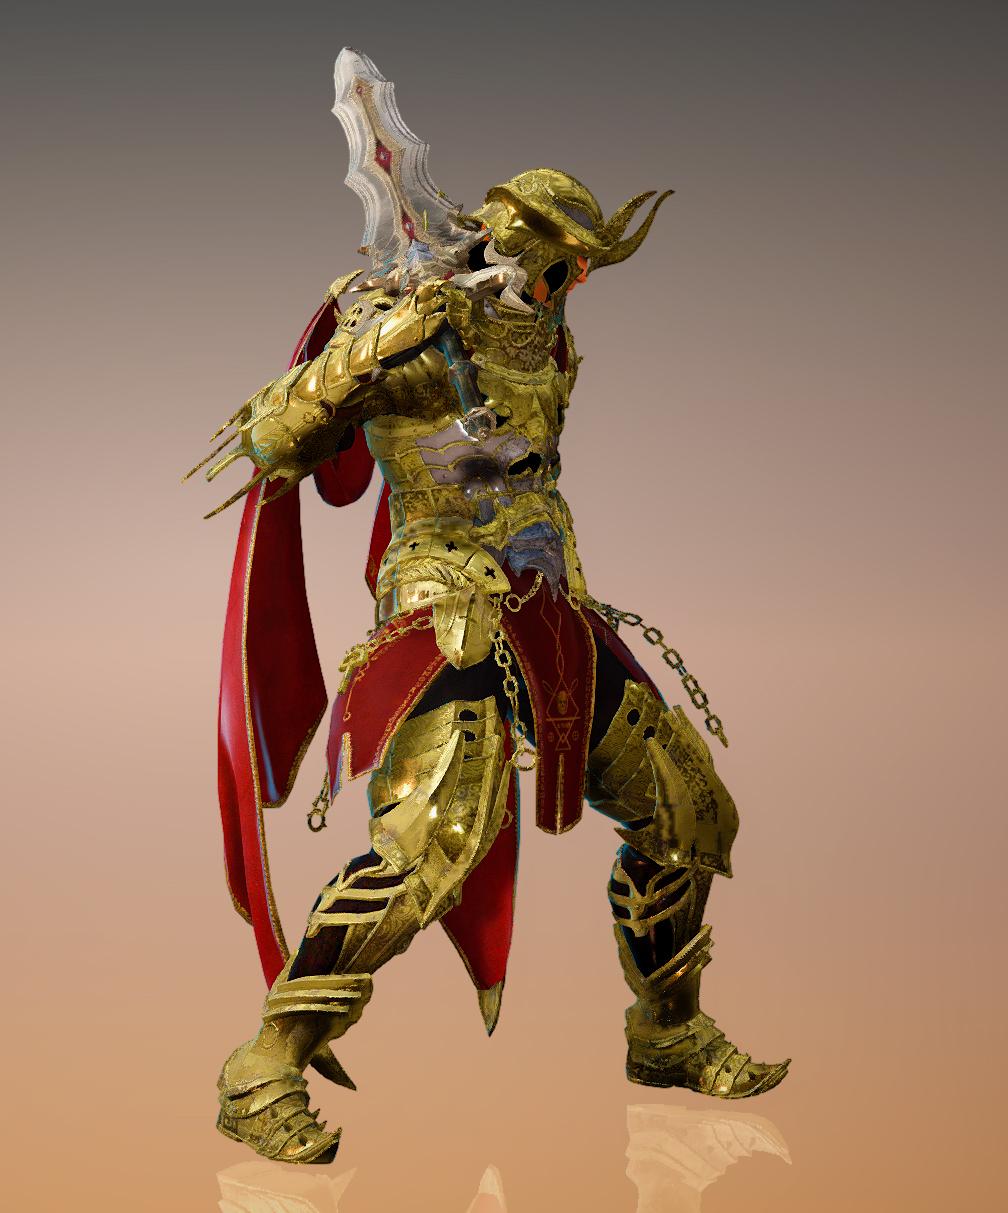 Bdo Warrior Doomsday